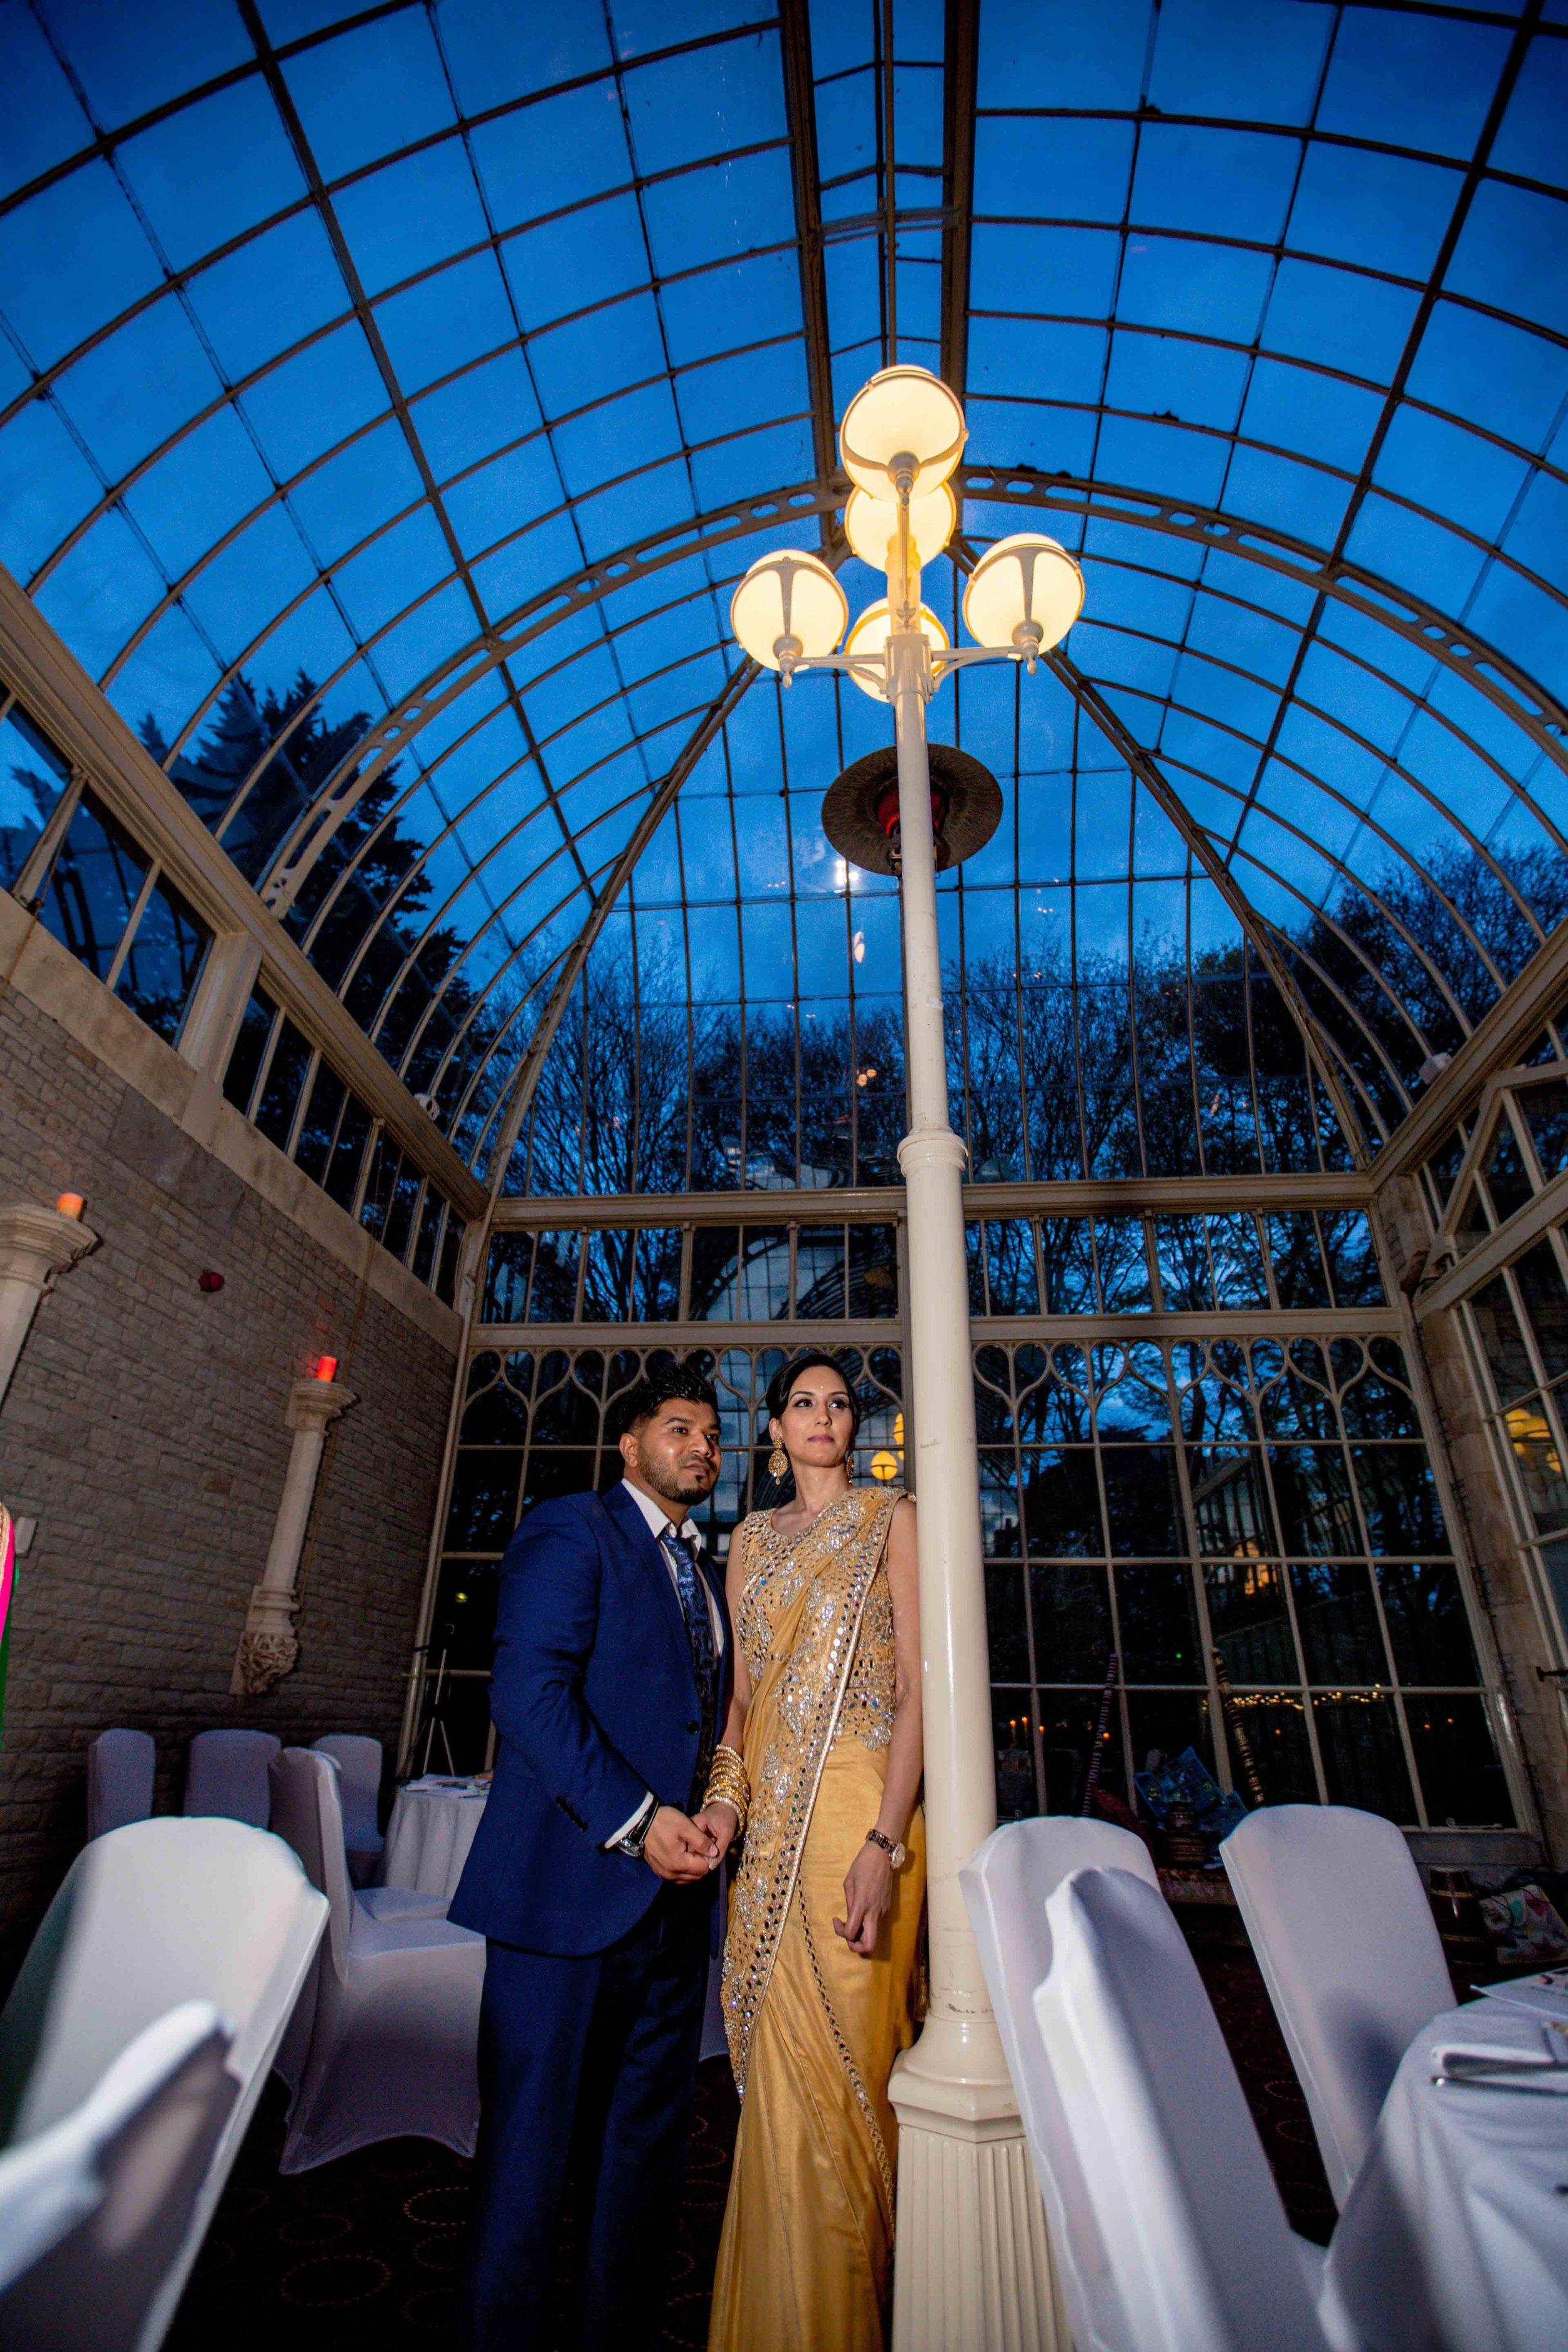 tortworth-Hotel-gloucester-birthday-wedding-photographer-natalia-smith-photography-15.jpg